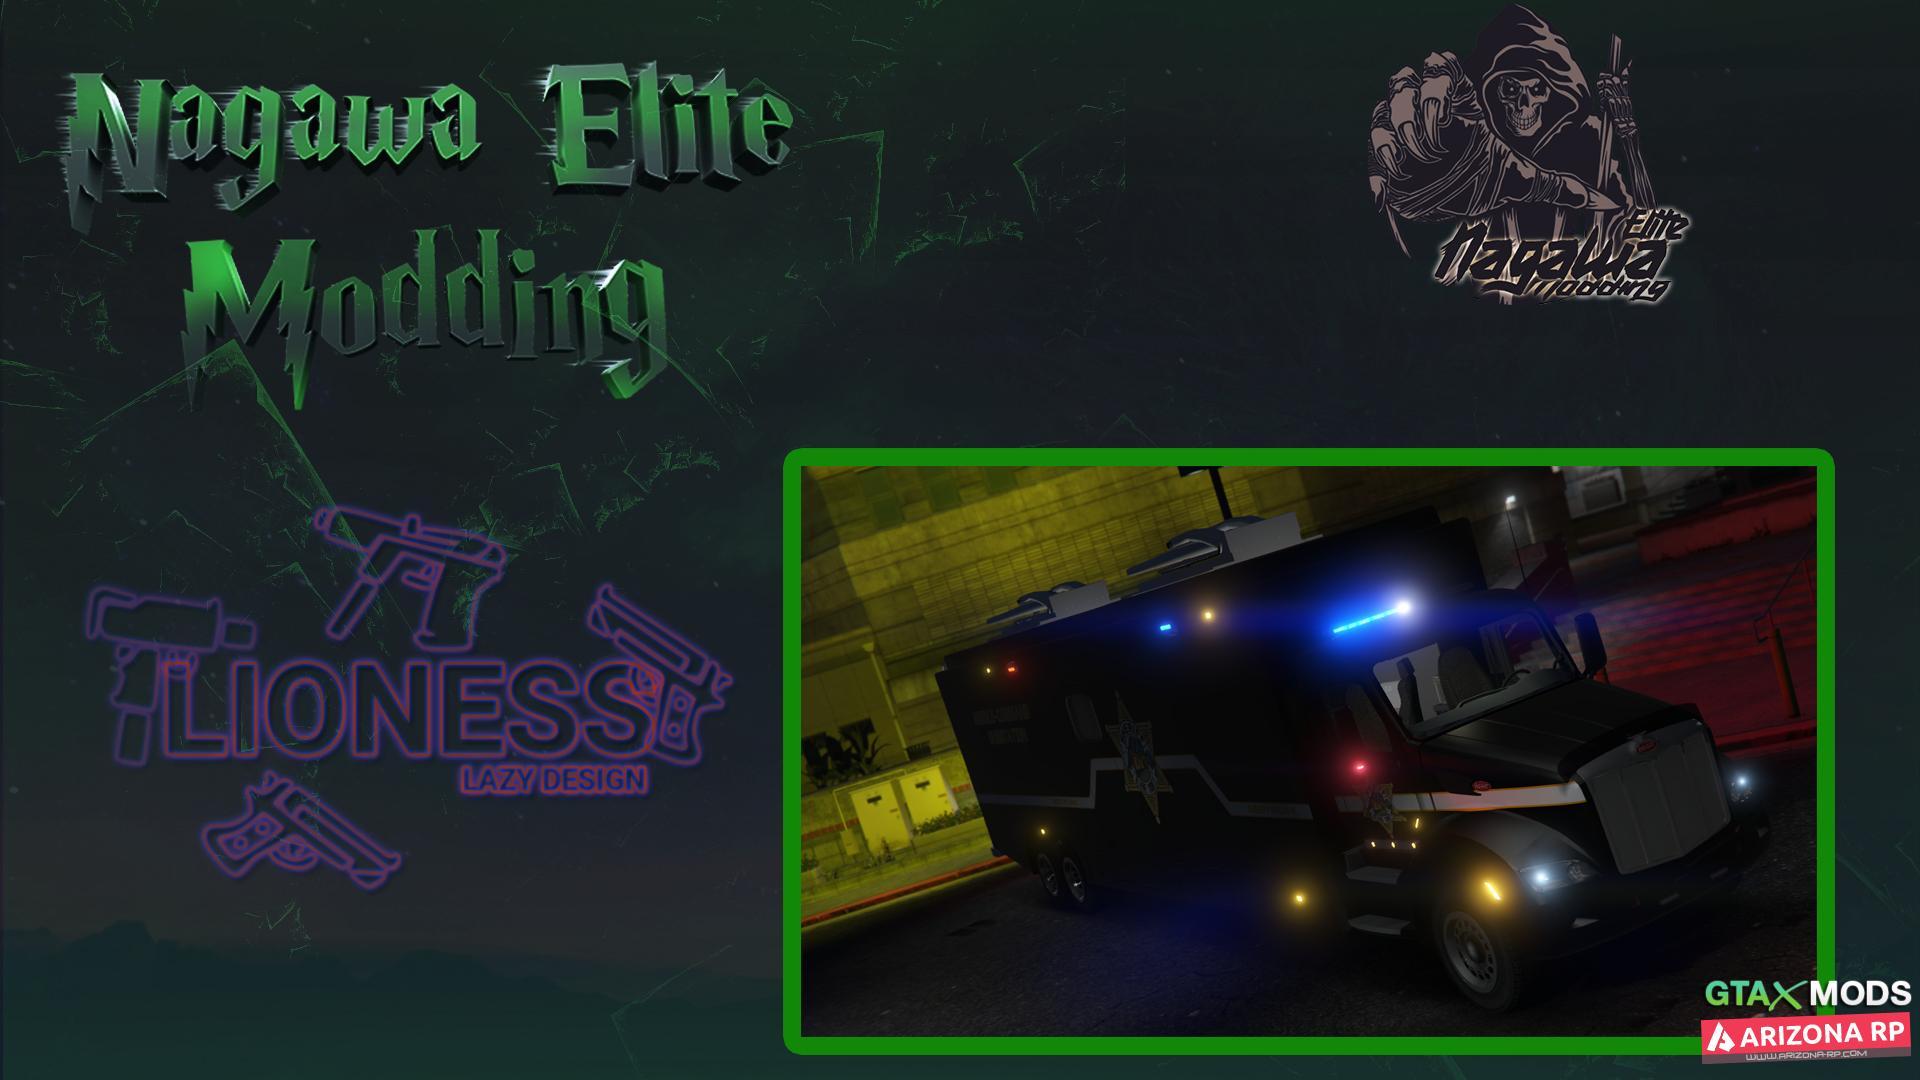 New Car Police   Nagawa Elite Modding